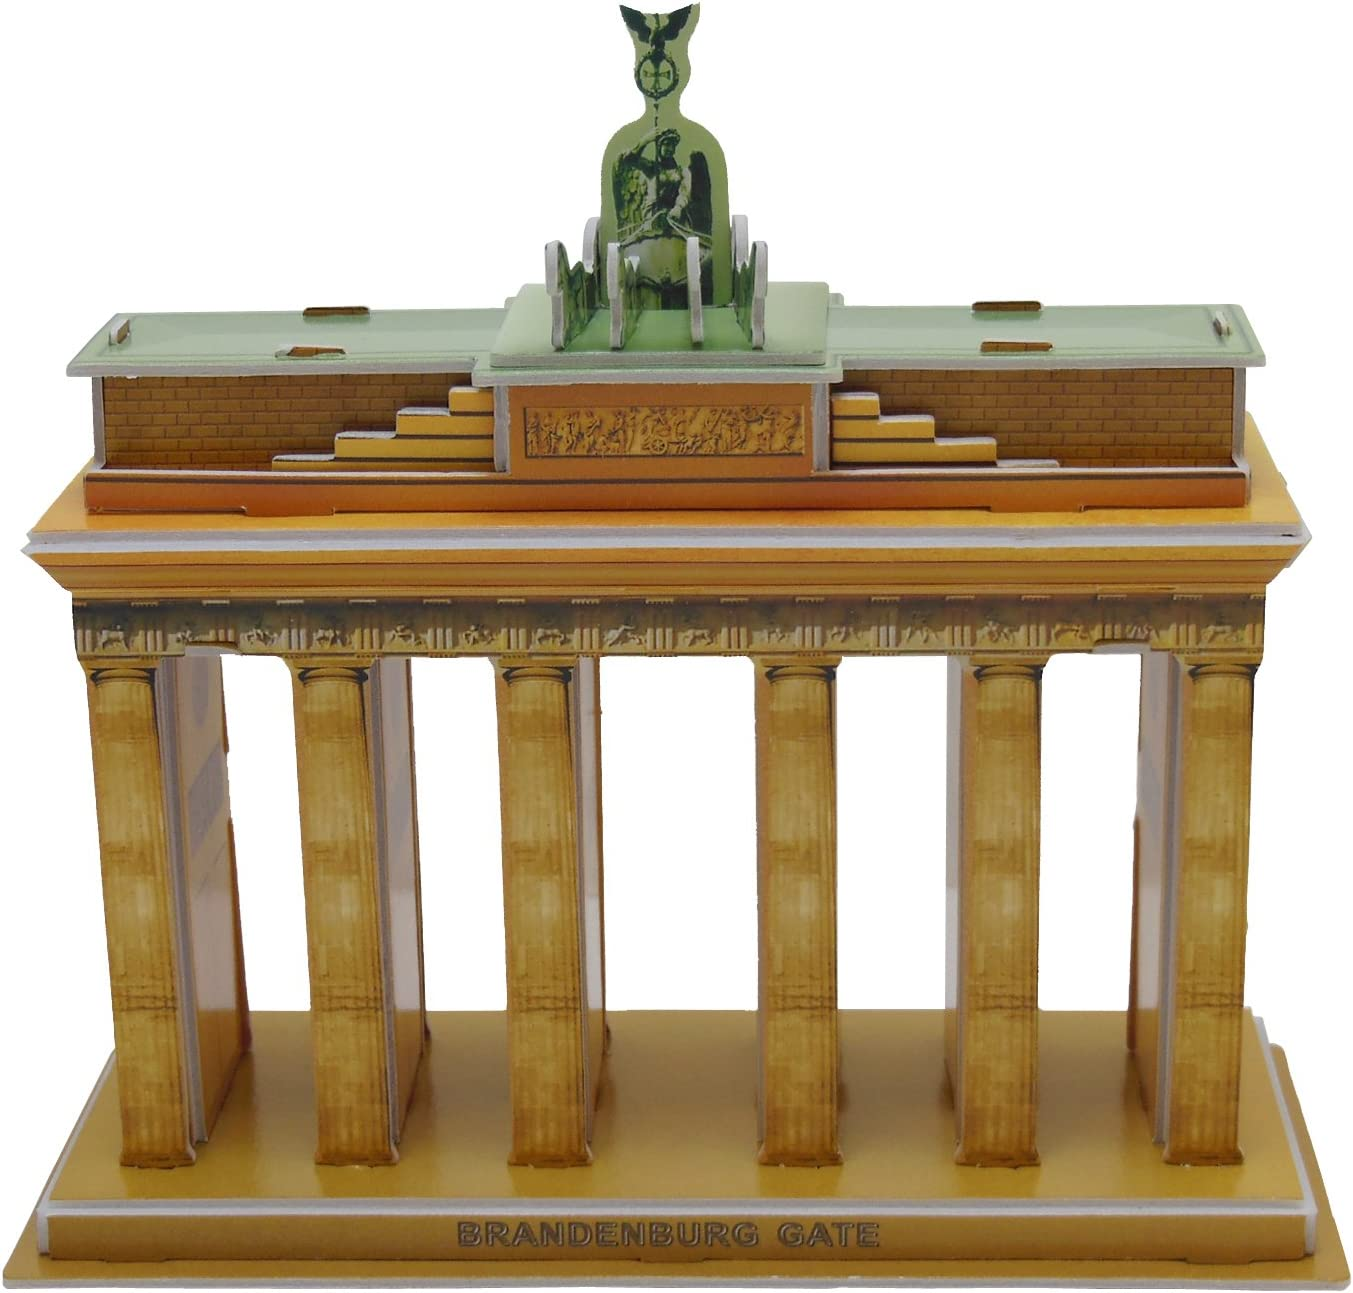 Runsong Creative 3D Puzzle Paper Model Brandenburg Gate DIY Fun & Educational Toys World Great Architecture Series, 32 Pcs